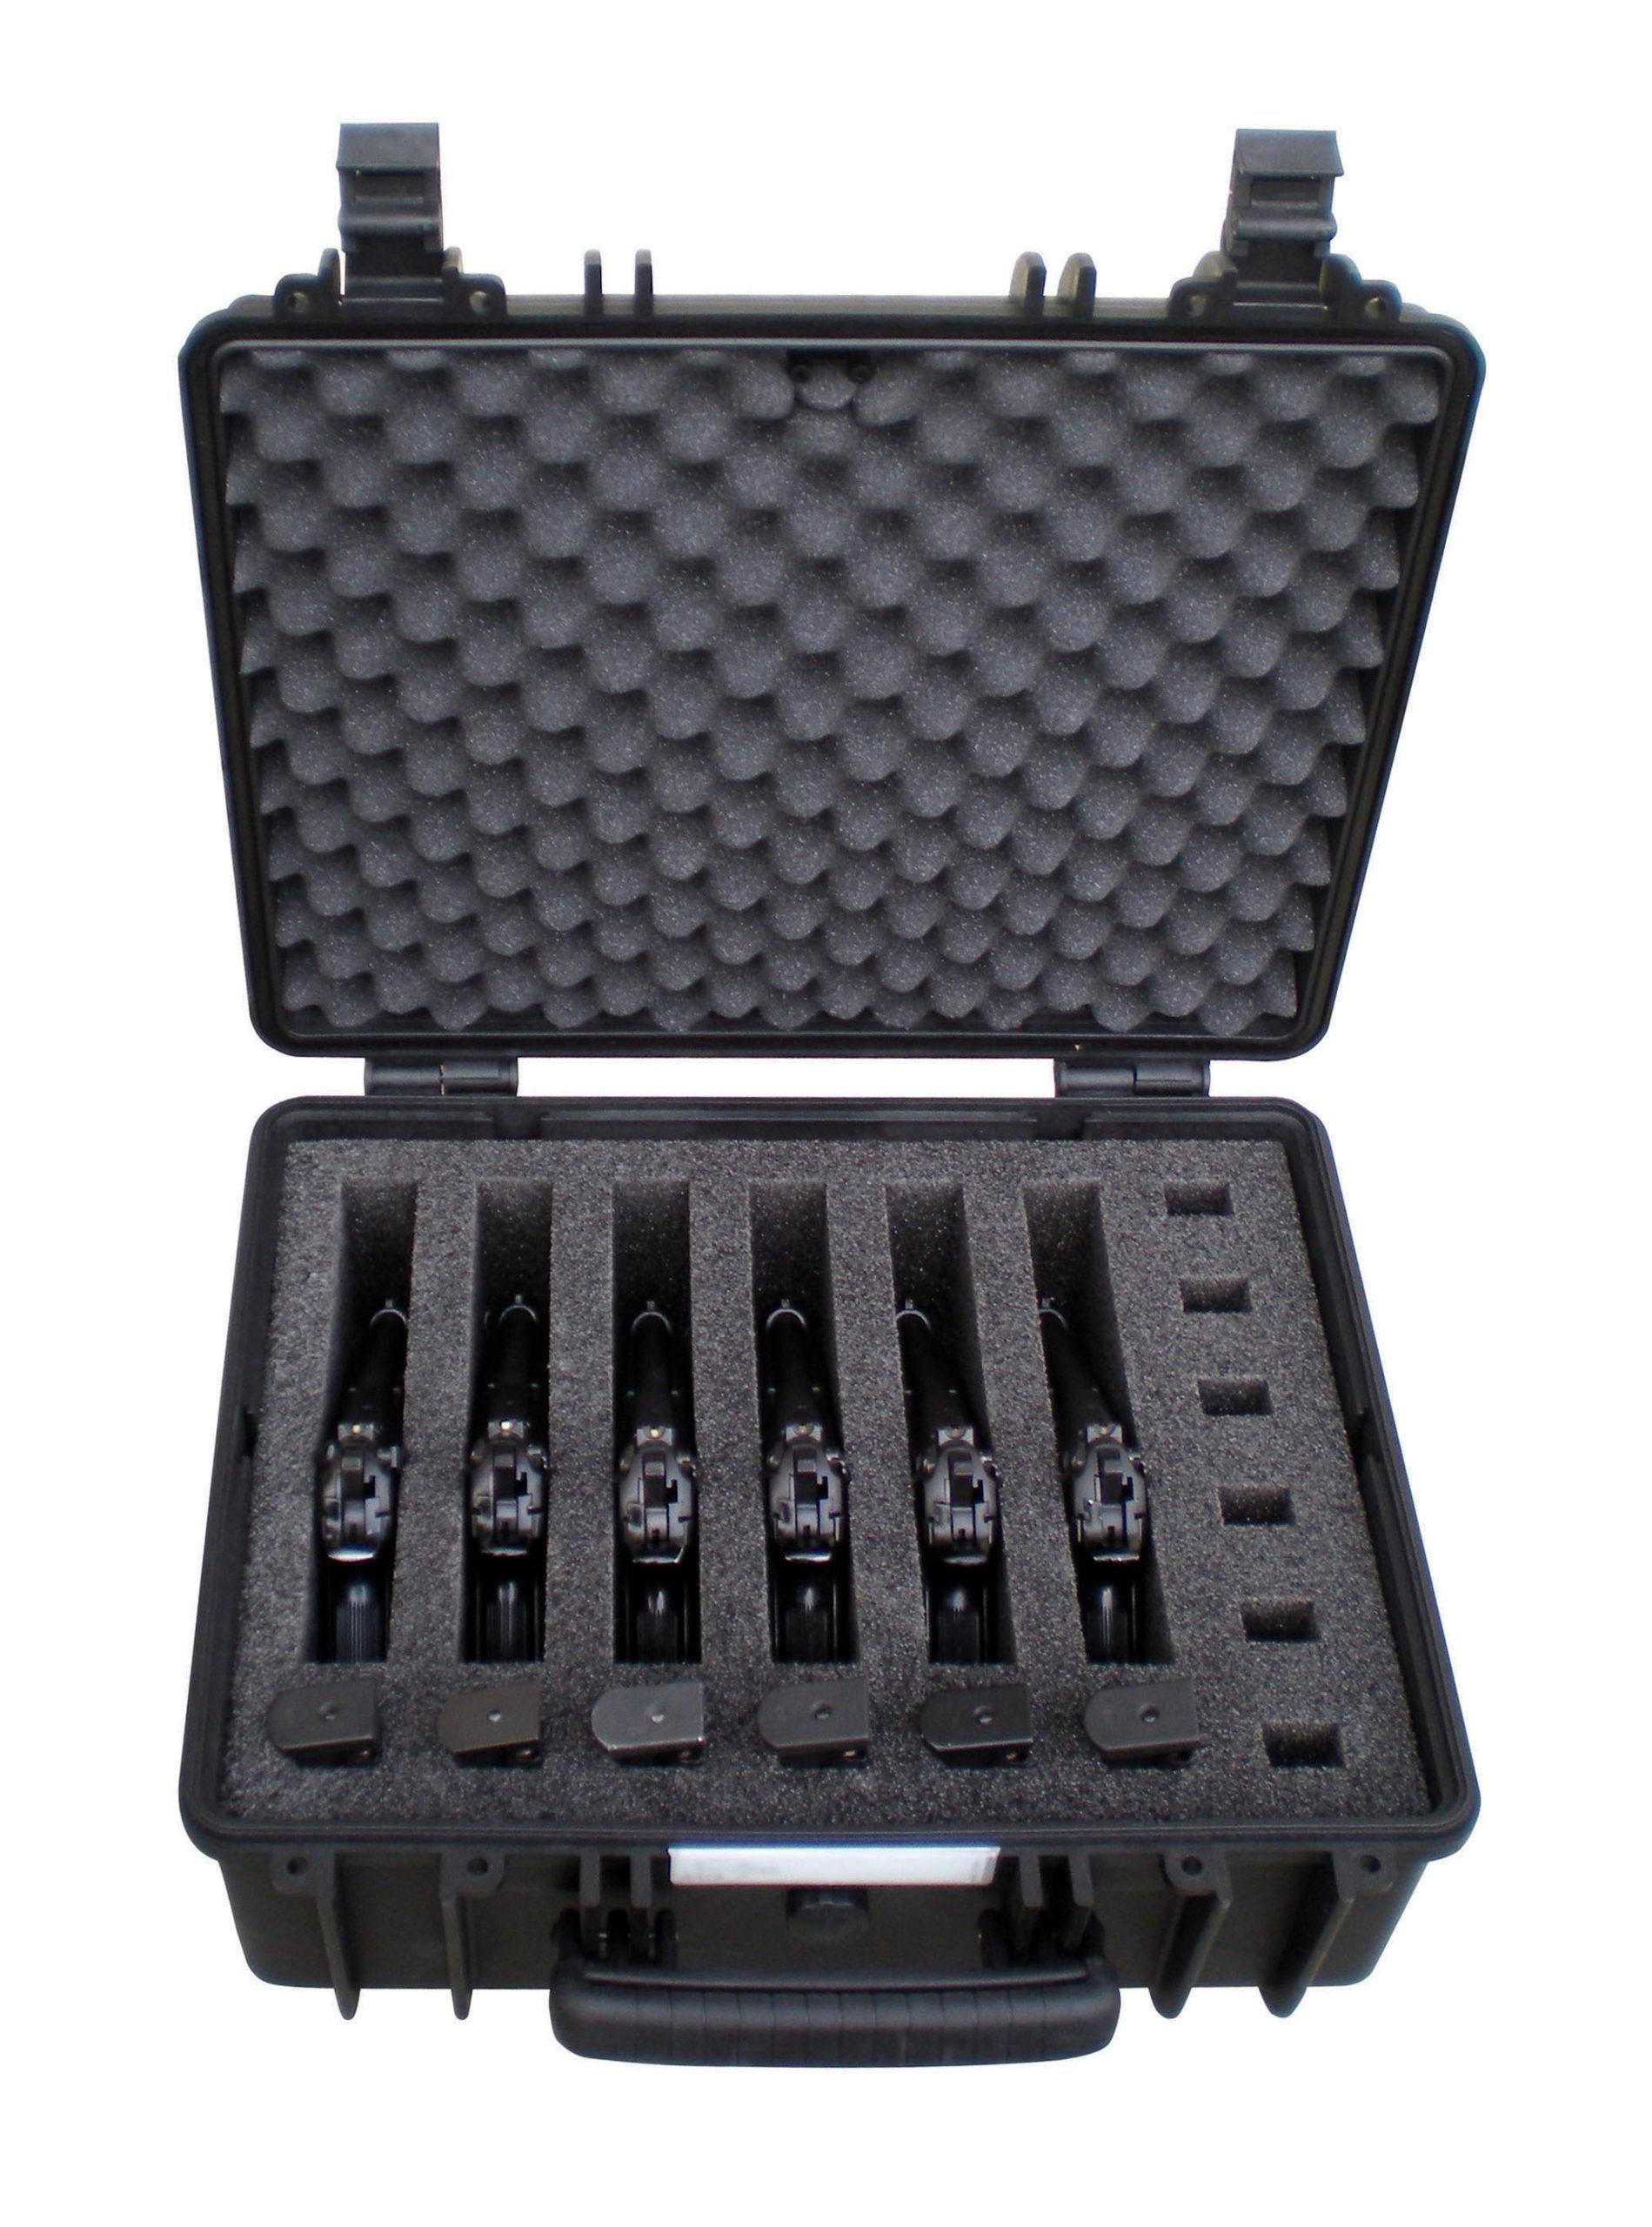 Explorer Cases Mod. 4419.B 6P für 6 Kurzwaffen - Kurzwaffenschutzkoffer